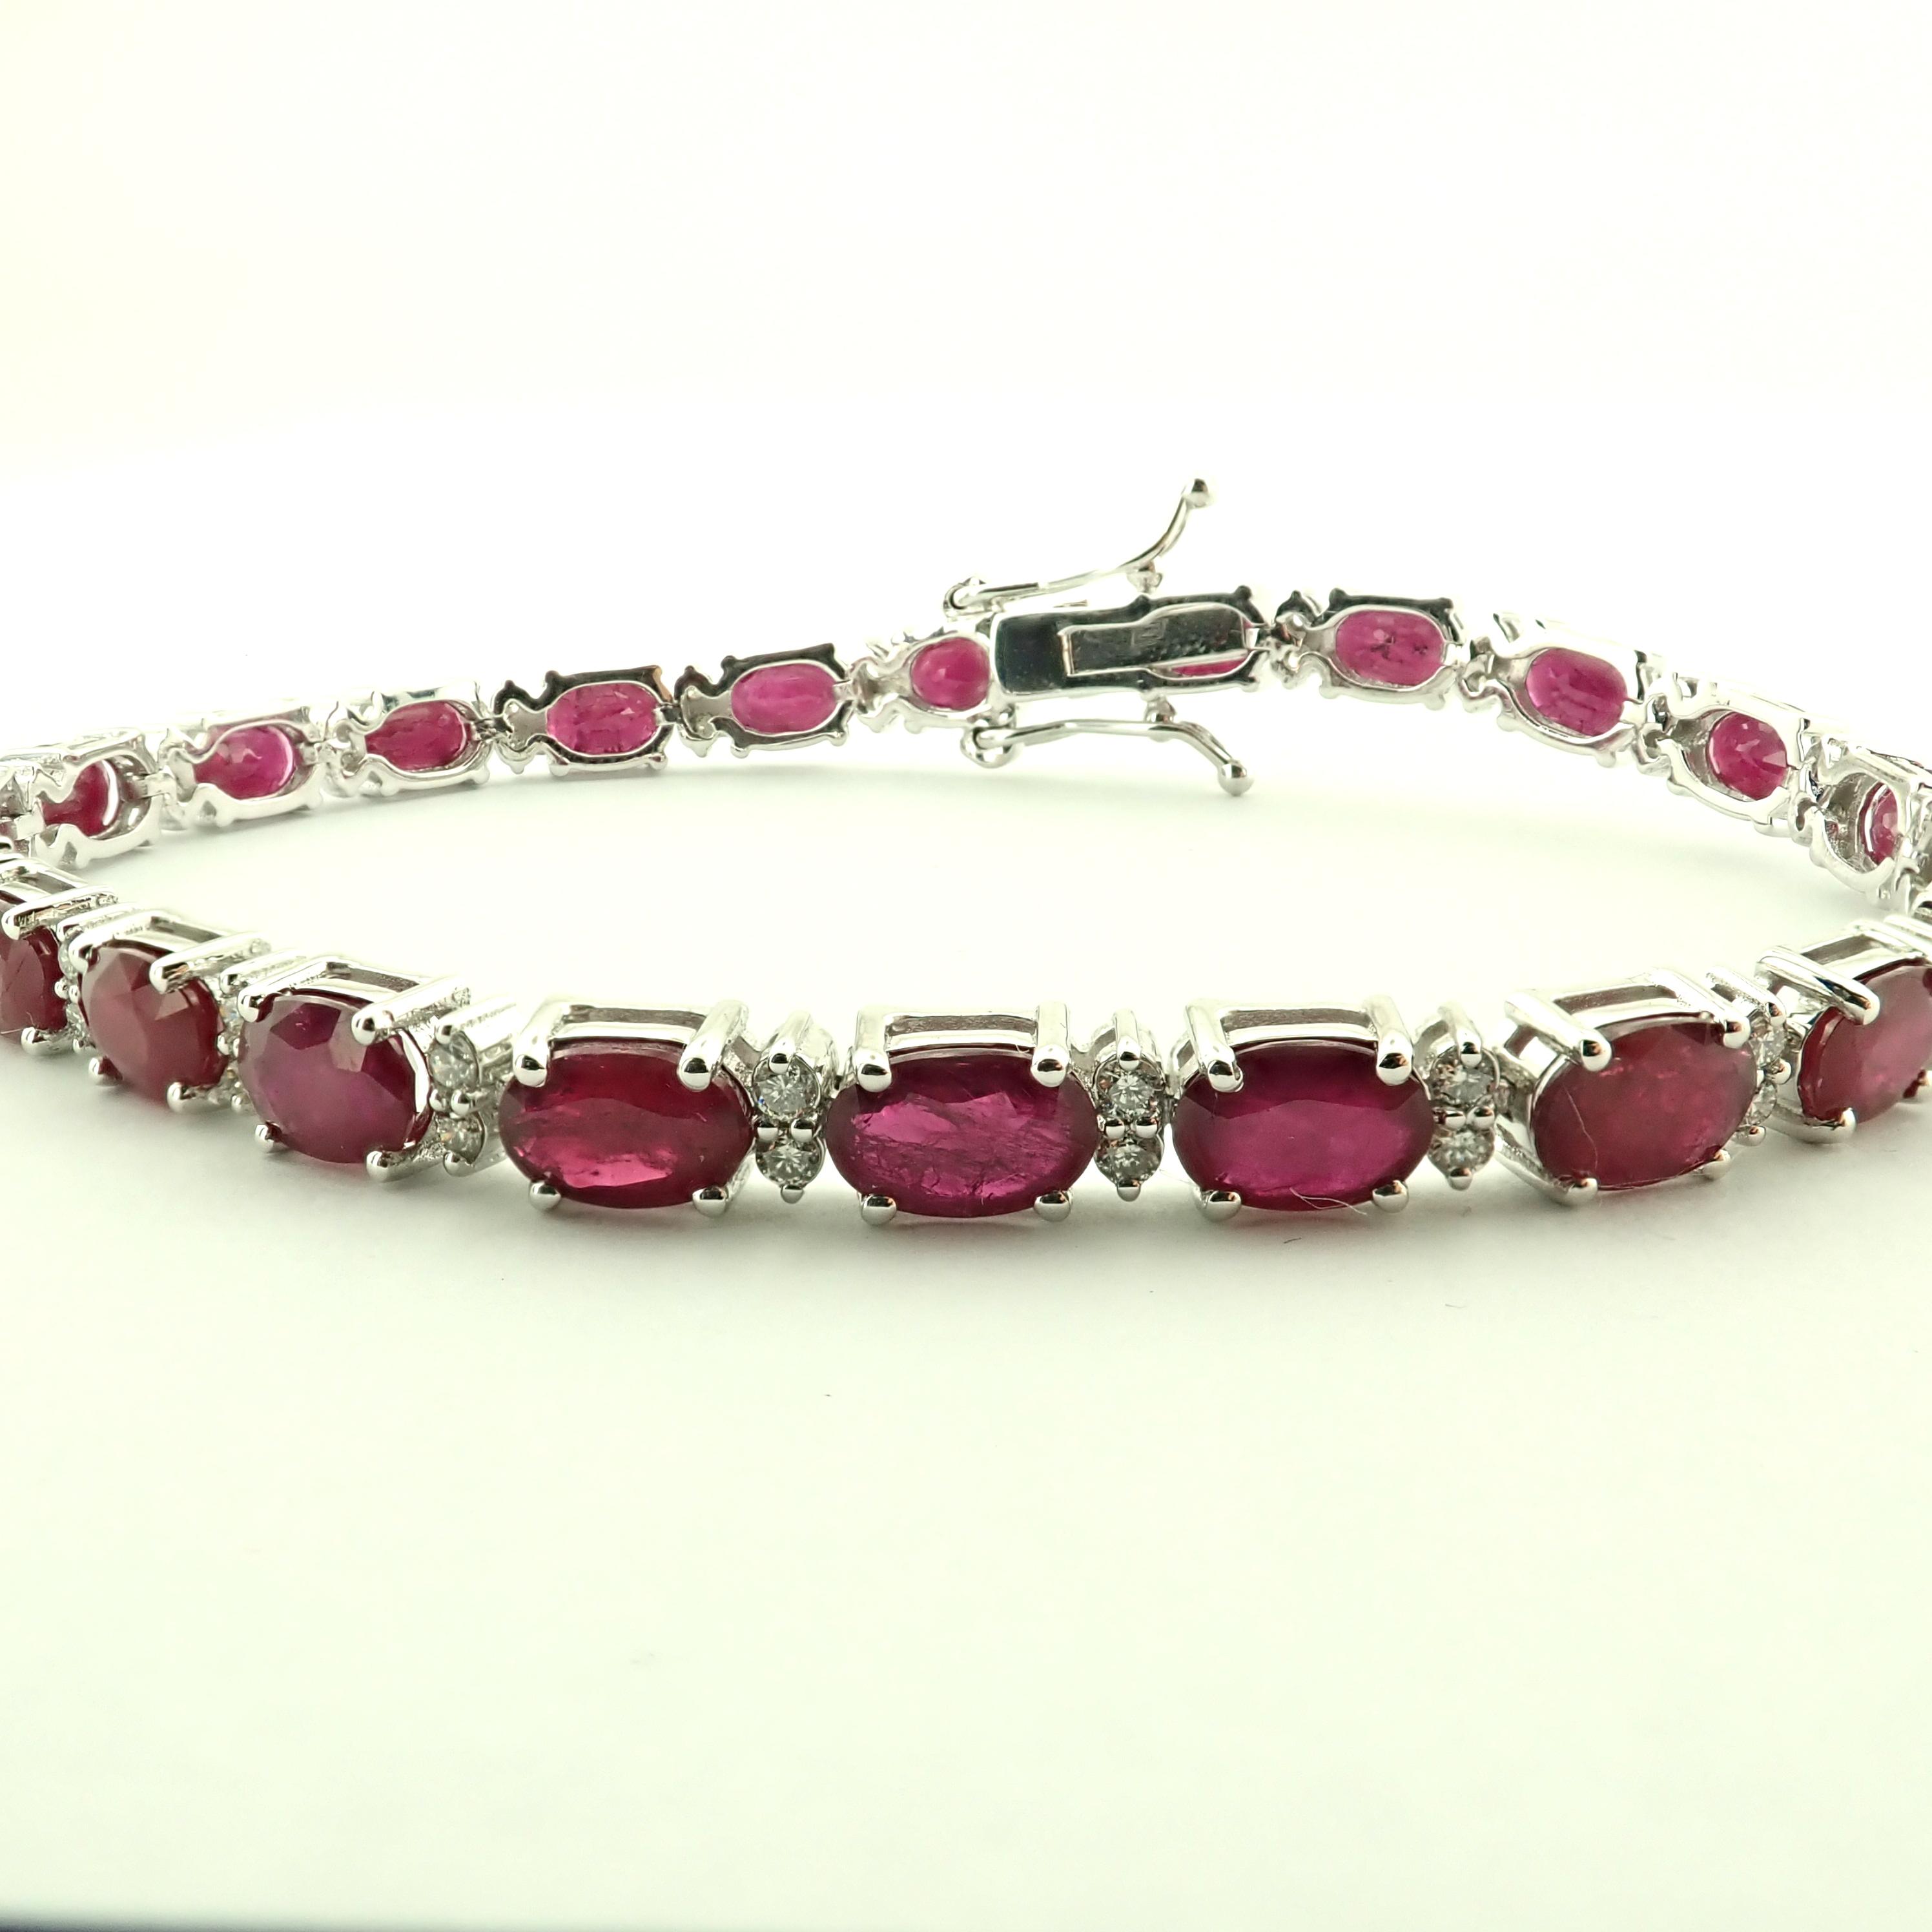 Lot 17 - 14K Diamond & Ruby Bracelet 11,87ct Total